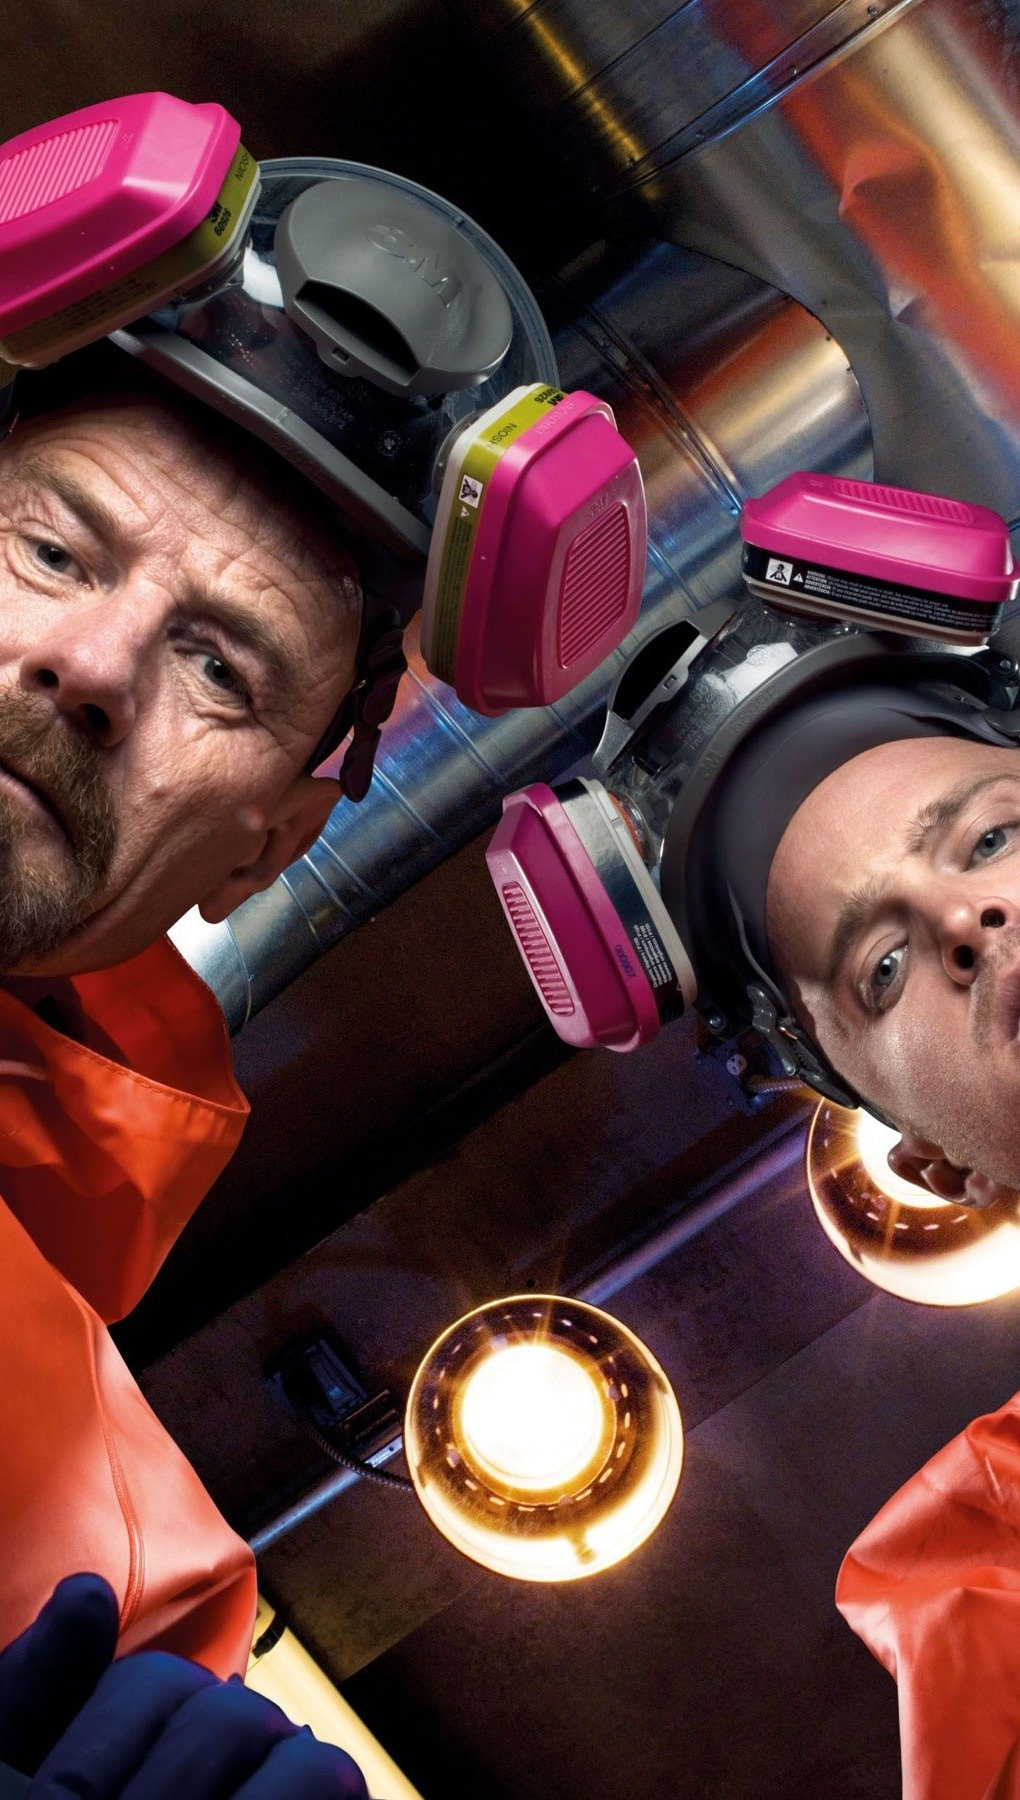 Wallpaper Walter White and Jesse Pinkman of Breaking Bad Vertical